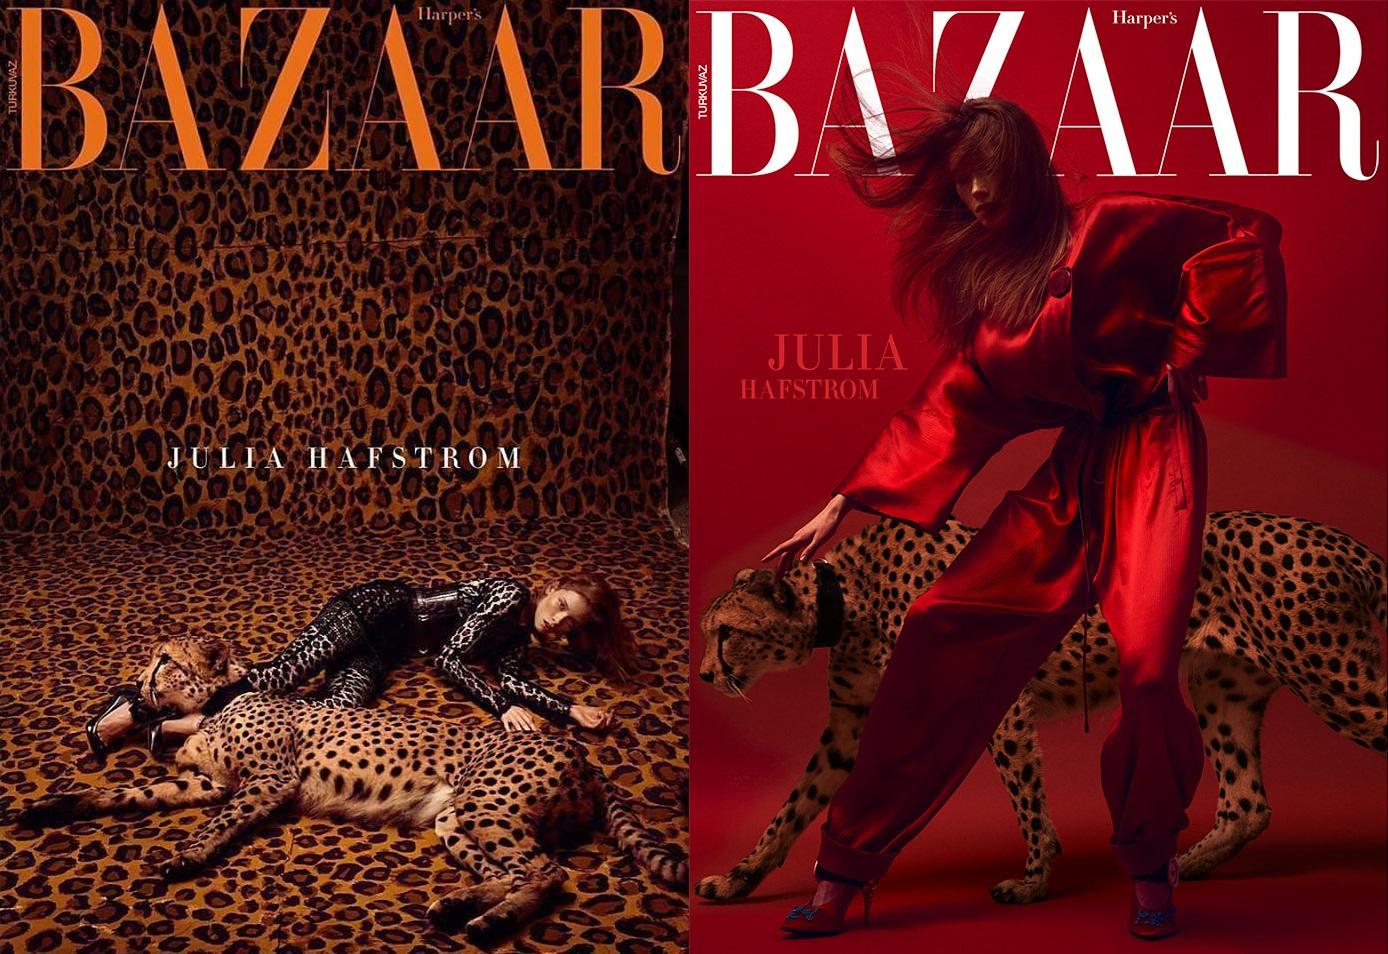 Harper's Bazaar杂志土耳其版:豹子与时尚豹纹女人,由时尚摄影Kristian Schuller掌镜,模特由Julia Hafstrom出境演绎。...